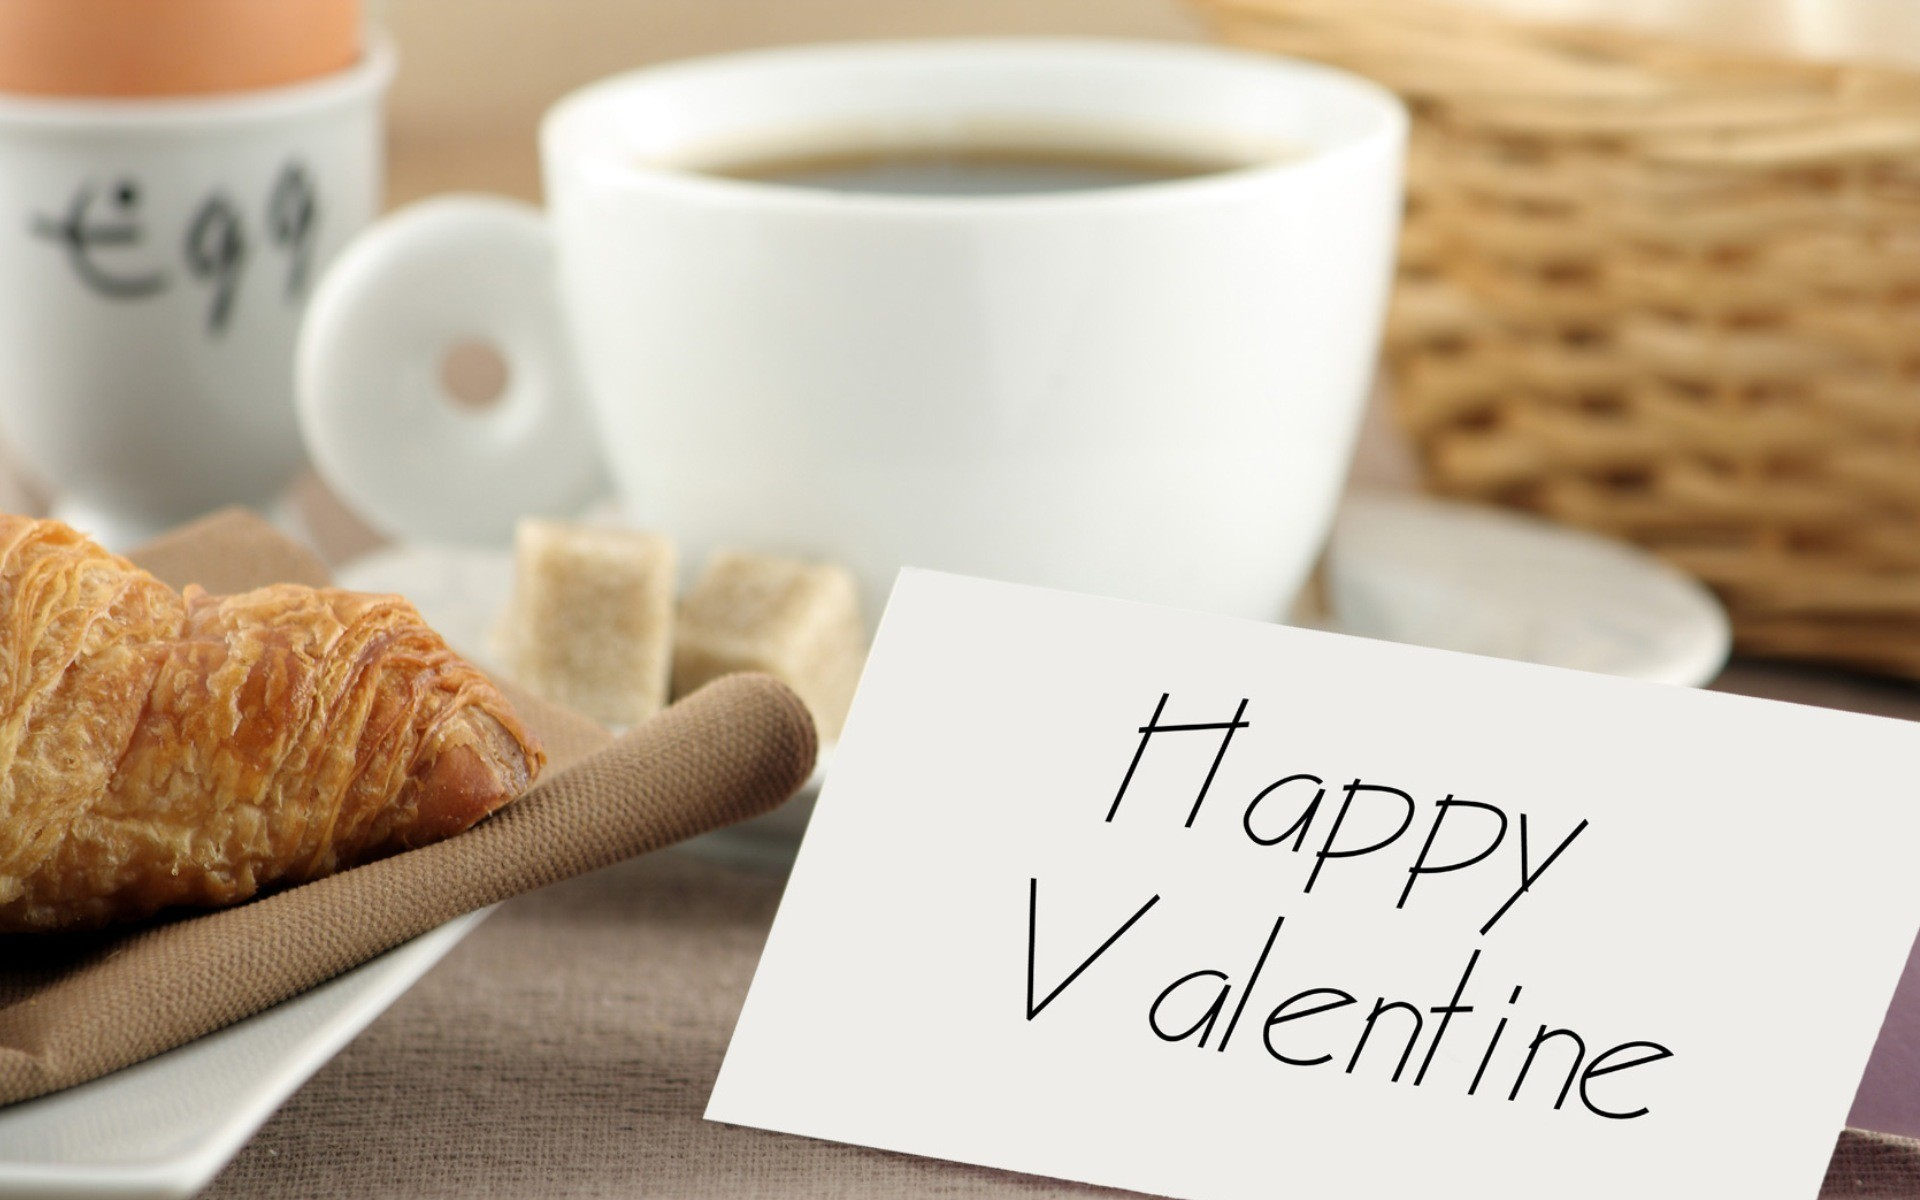 Desayuno San Valentine - 1920x1200